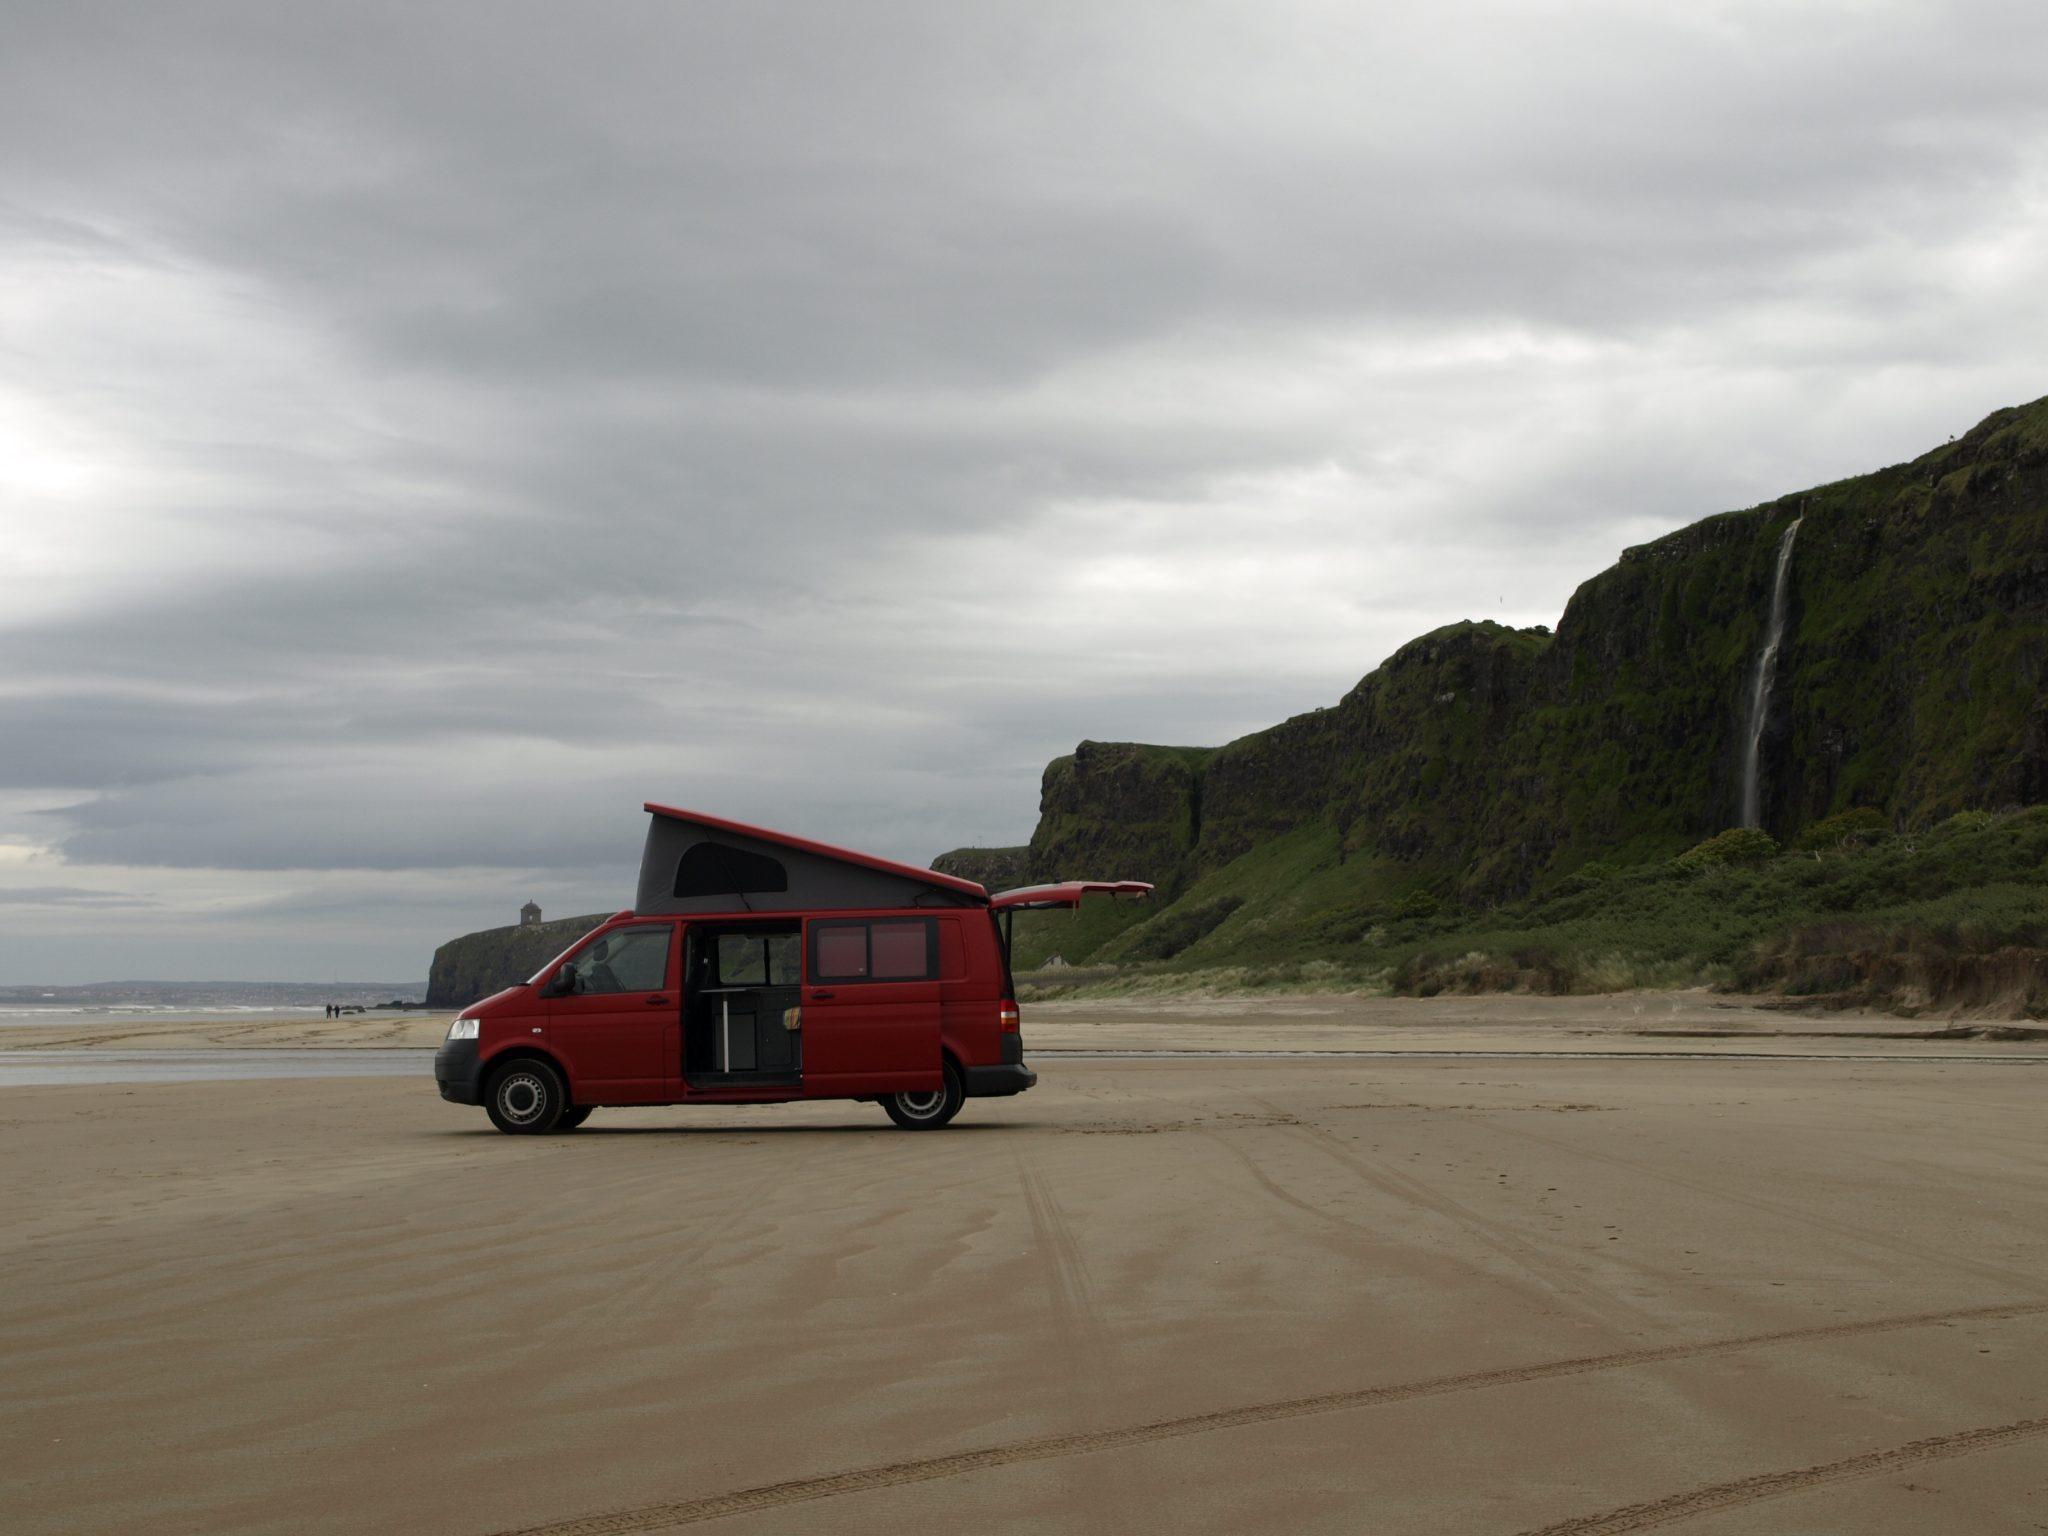 campervan beach